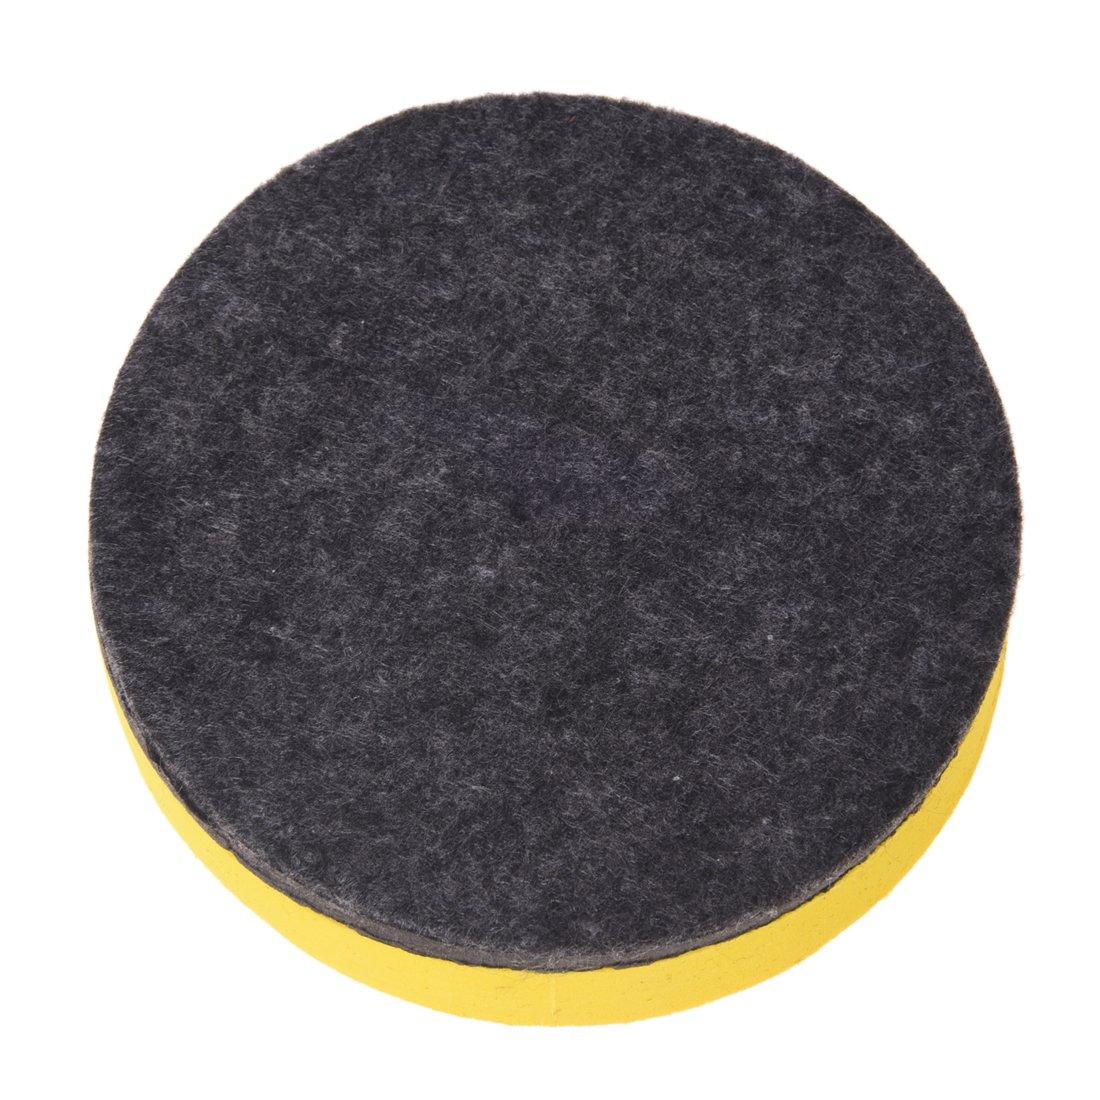 TOOGOO Magnetic White Board Blackboard Dry Wipe Dry wipe Marker Cleaner Eraser School R